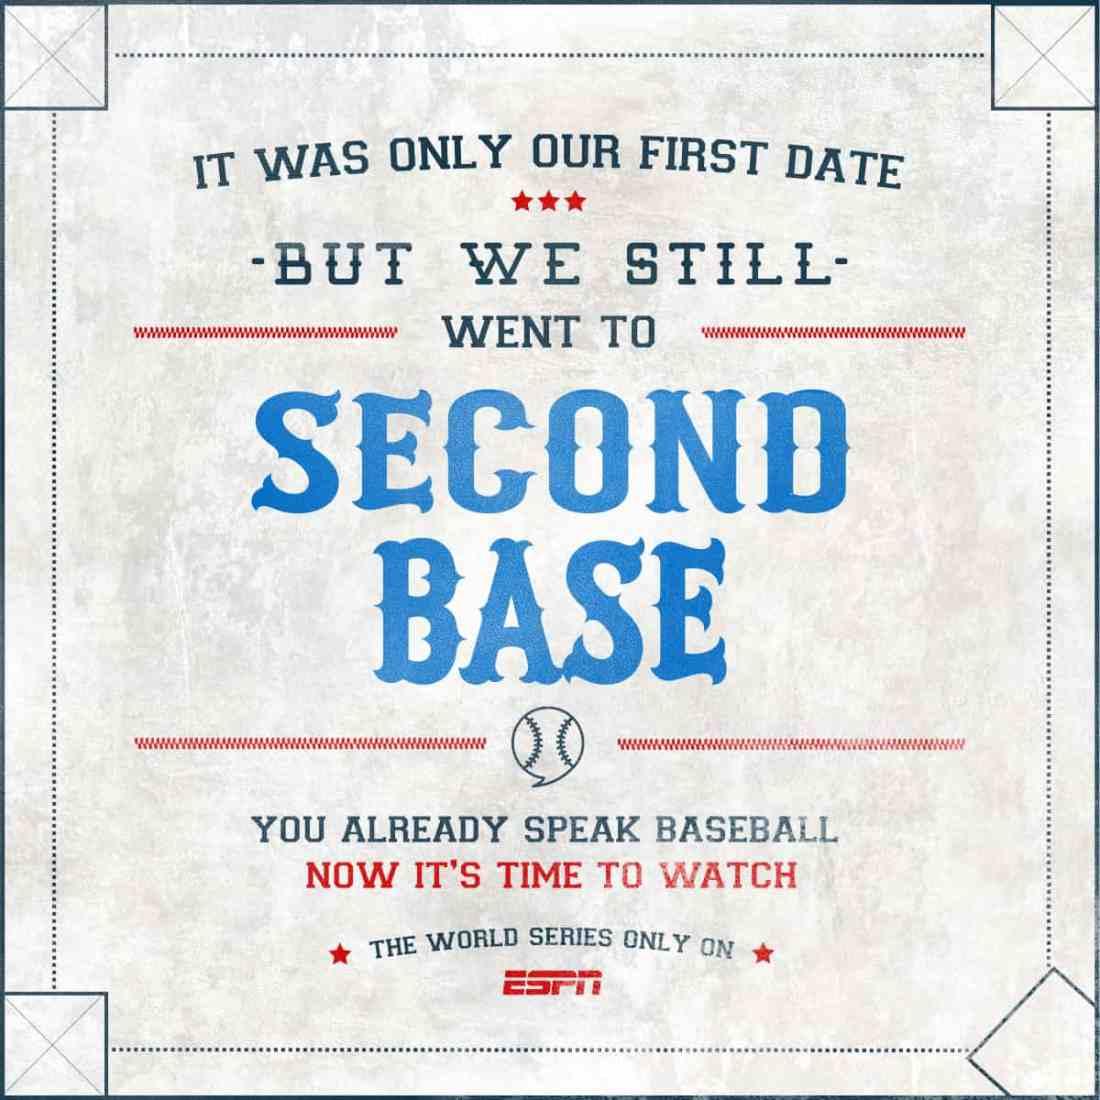 ESPN World Series Baseball Eran Thomson Creative Director, Copywriter